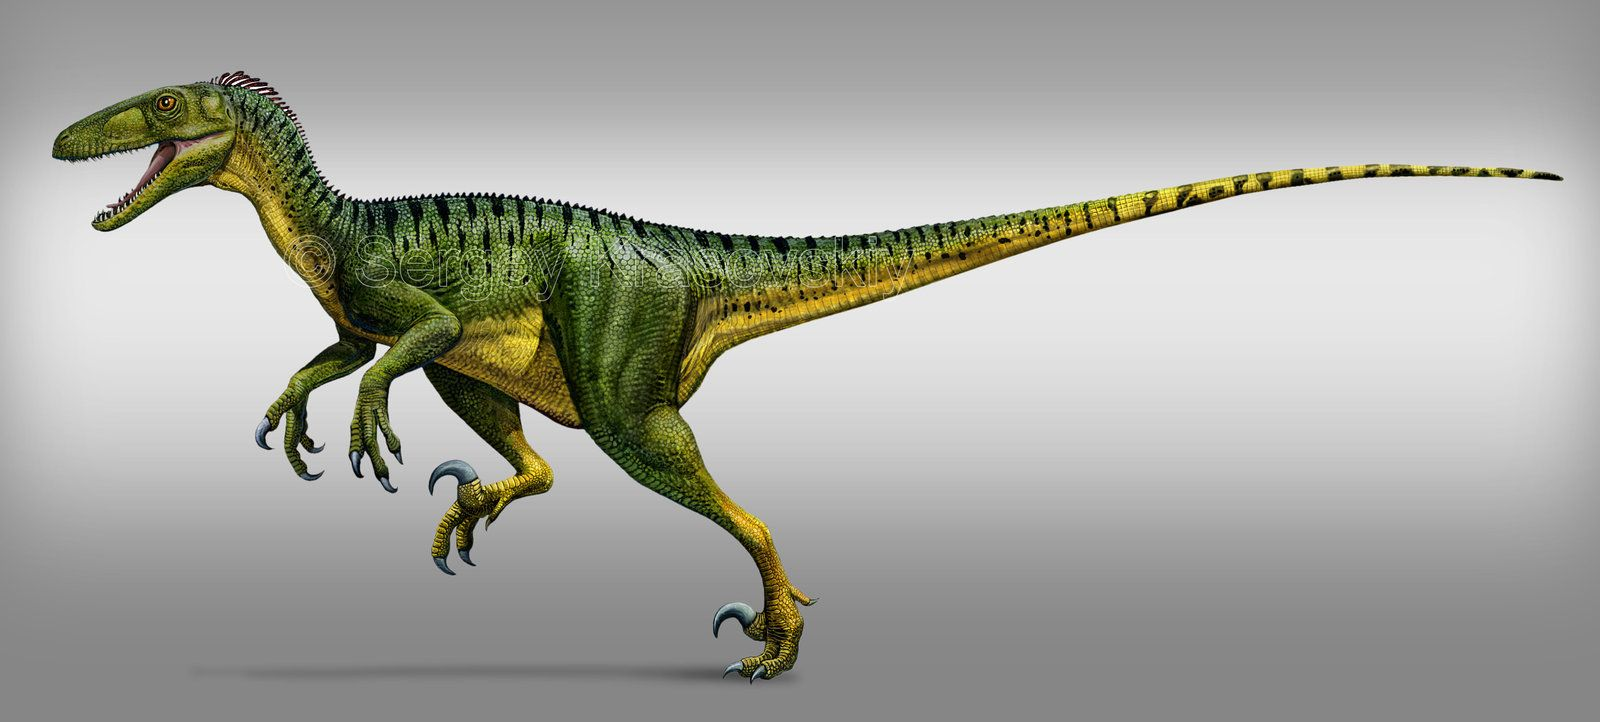 динозавр дейноних картинки обложек